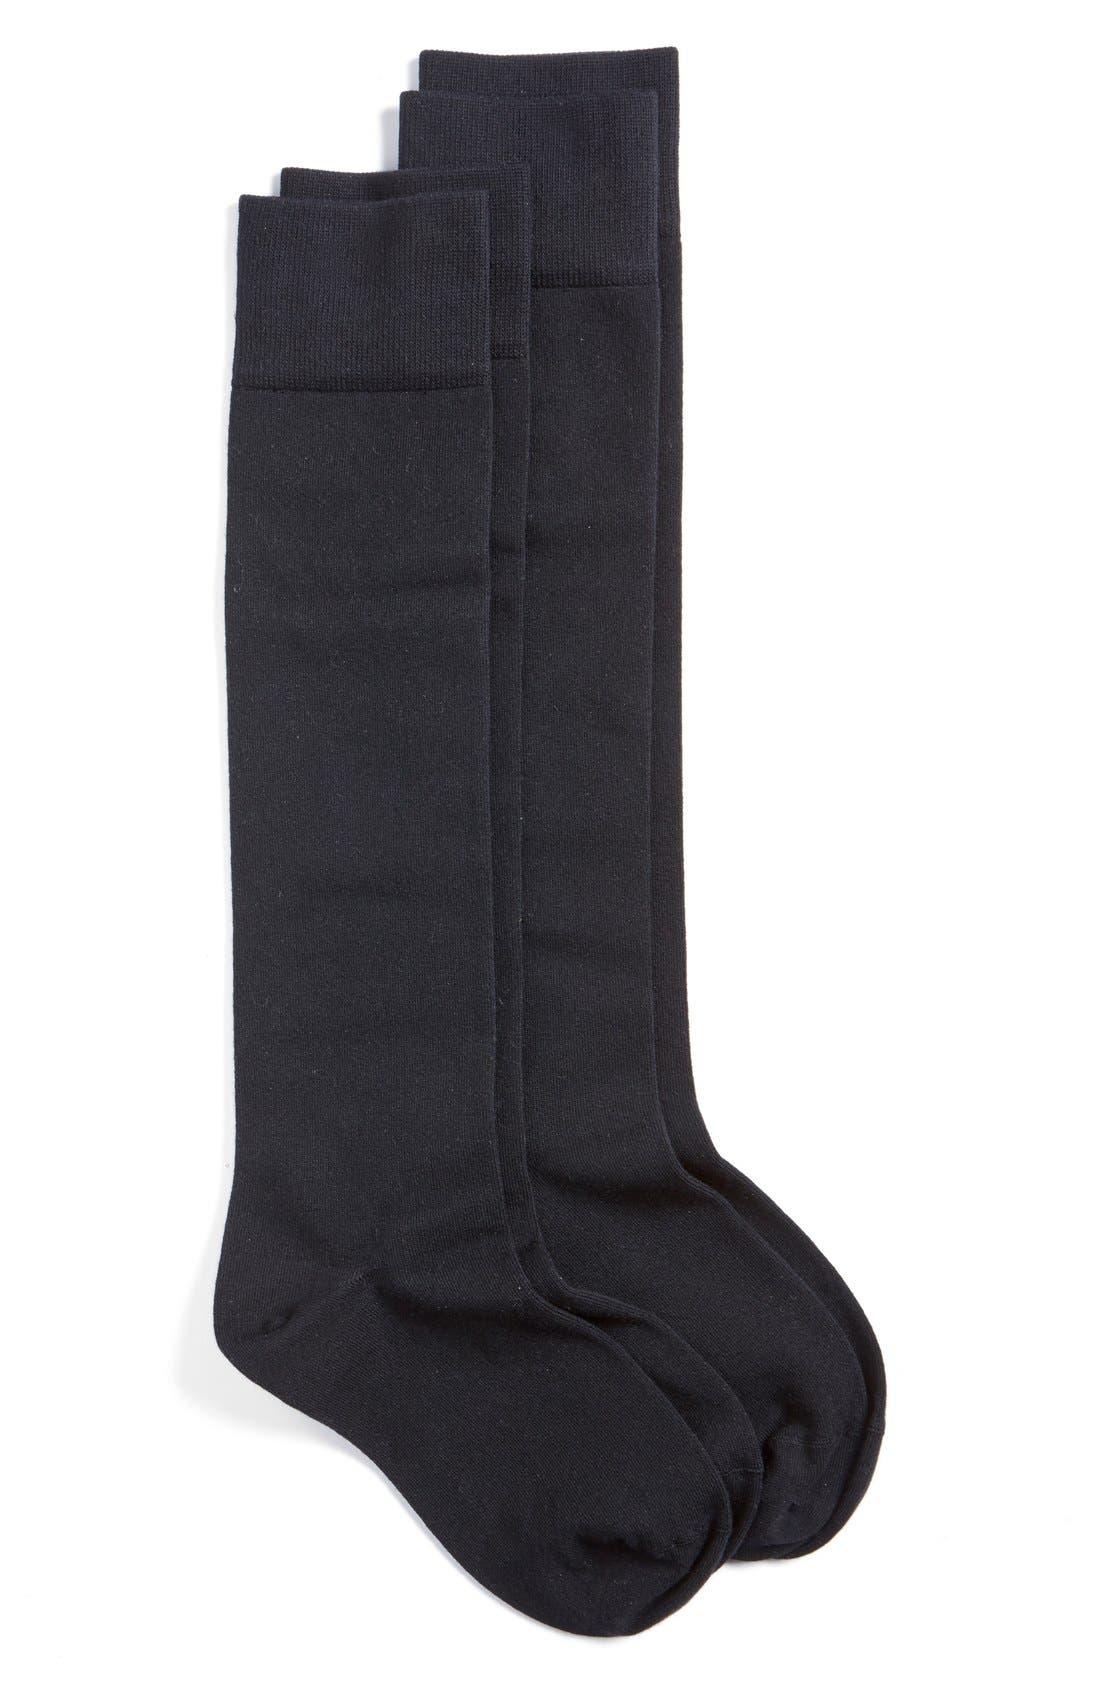 3990e328cad Women s Knee High Socks   Hosiery